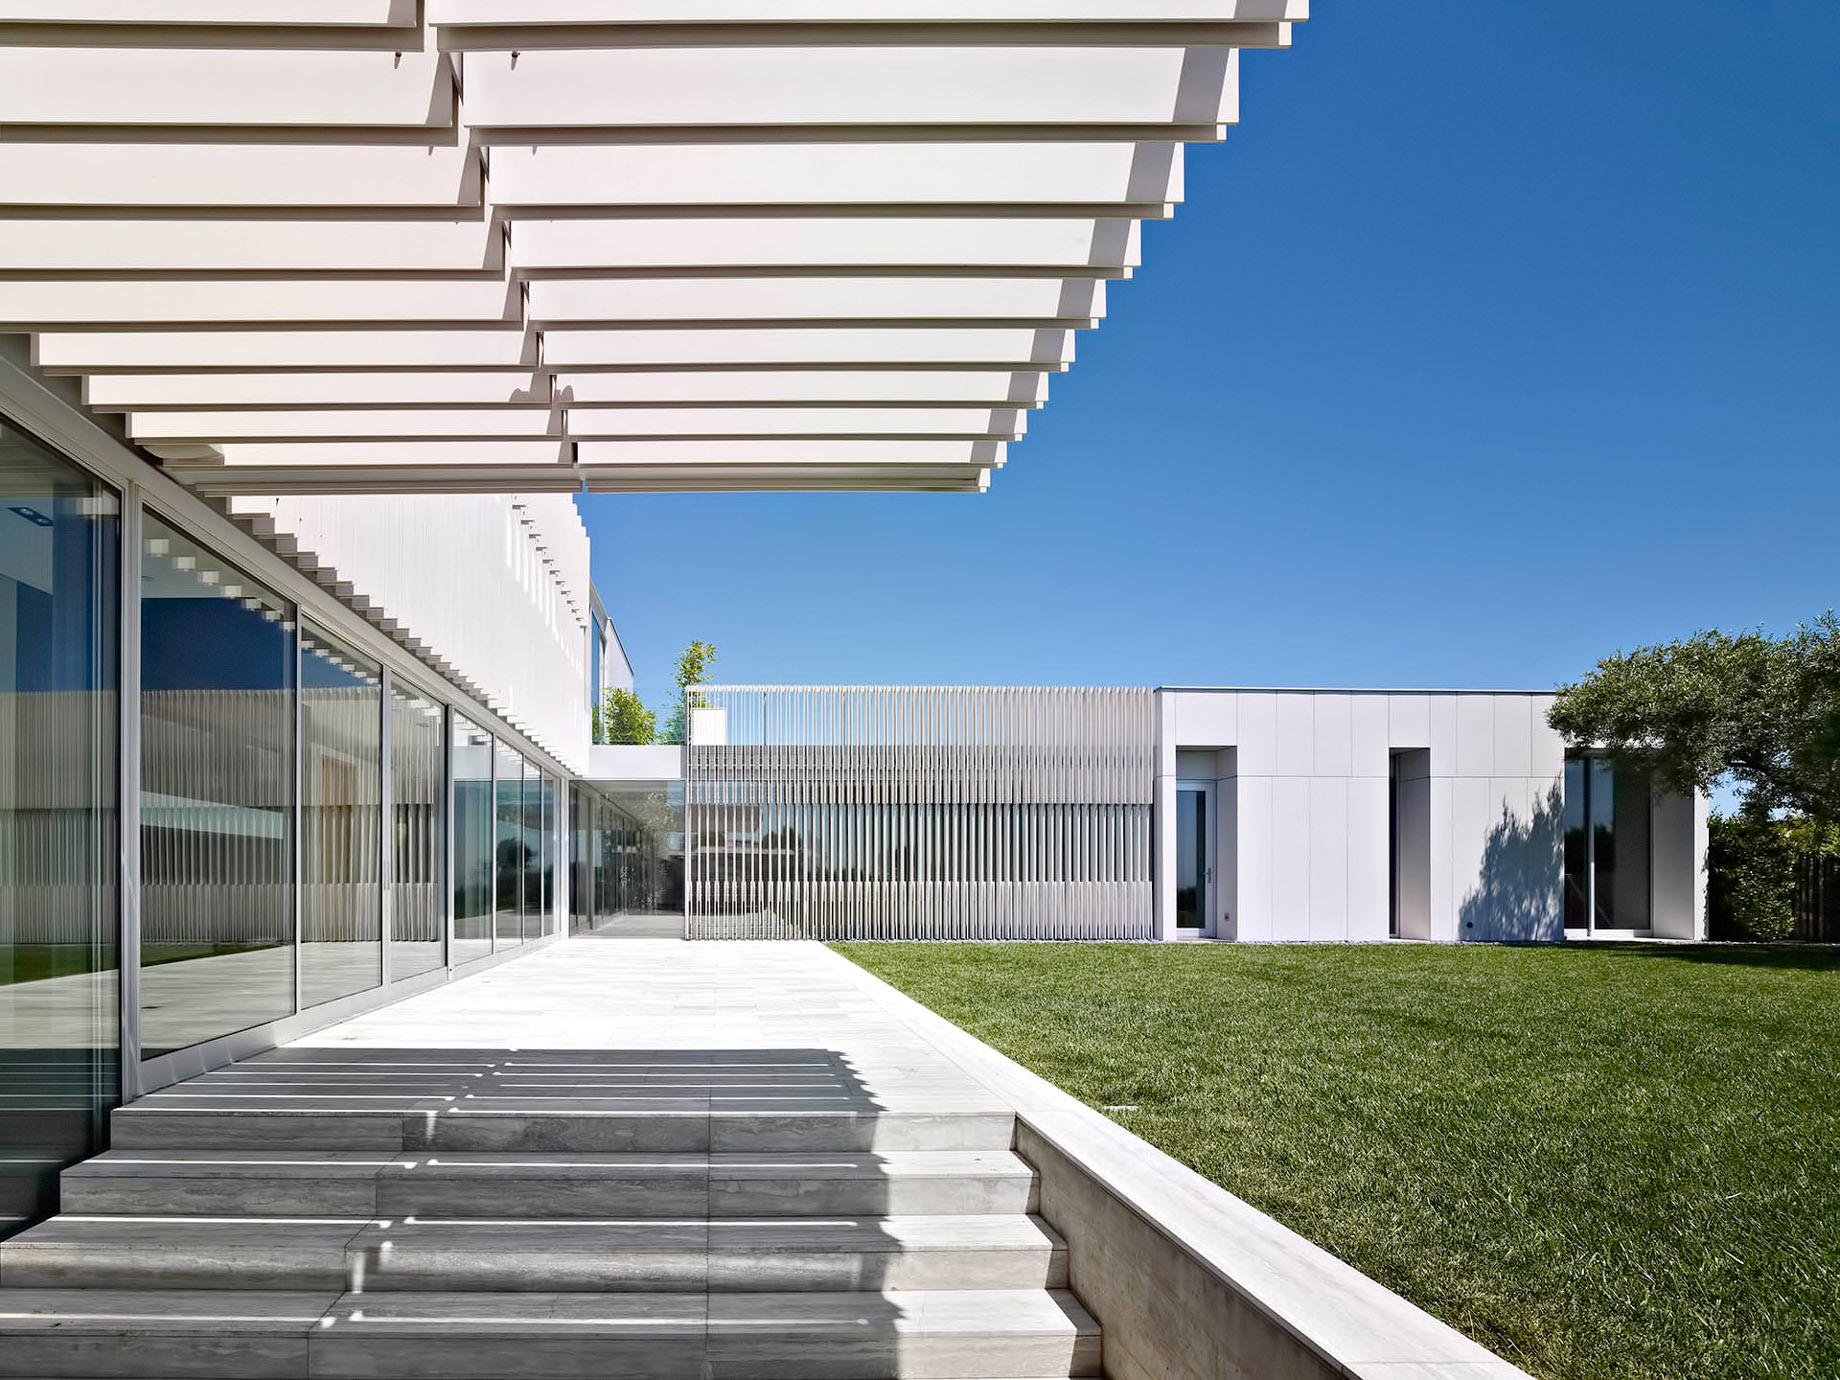 Oberfeld Residence - 9318 Nightingale Drive, Los Angeles, CA, USA